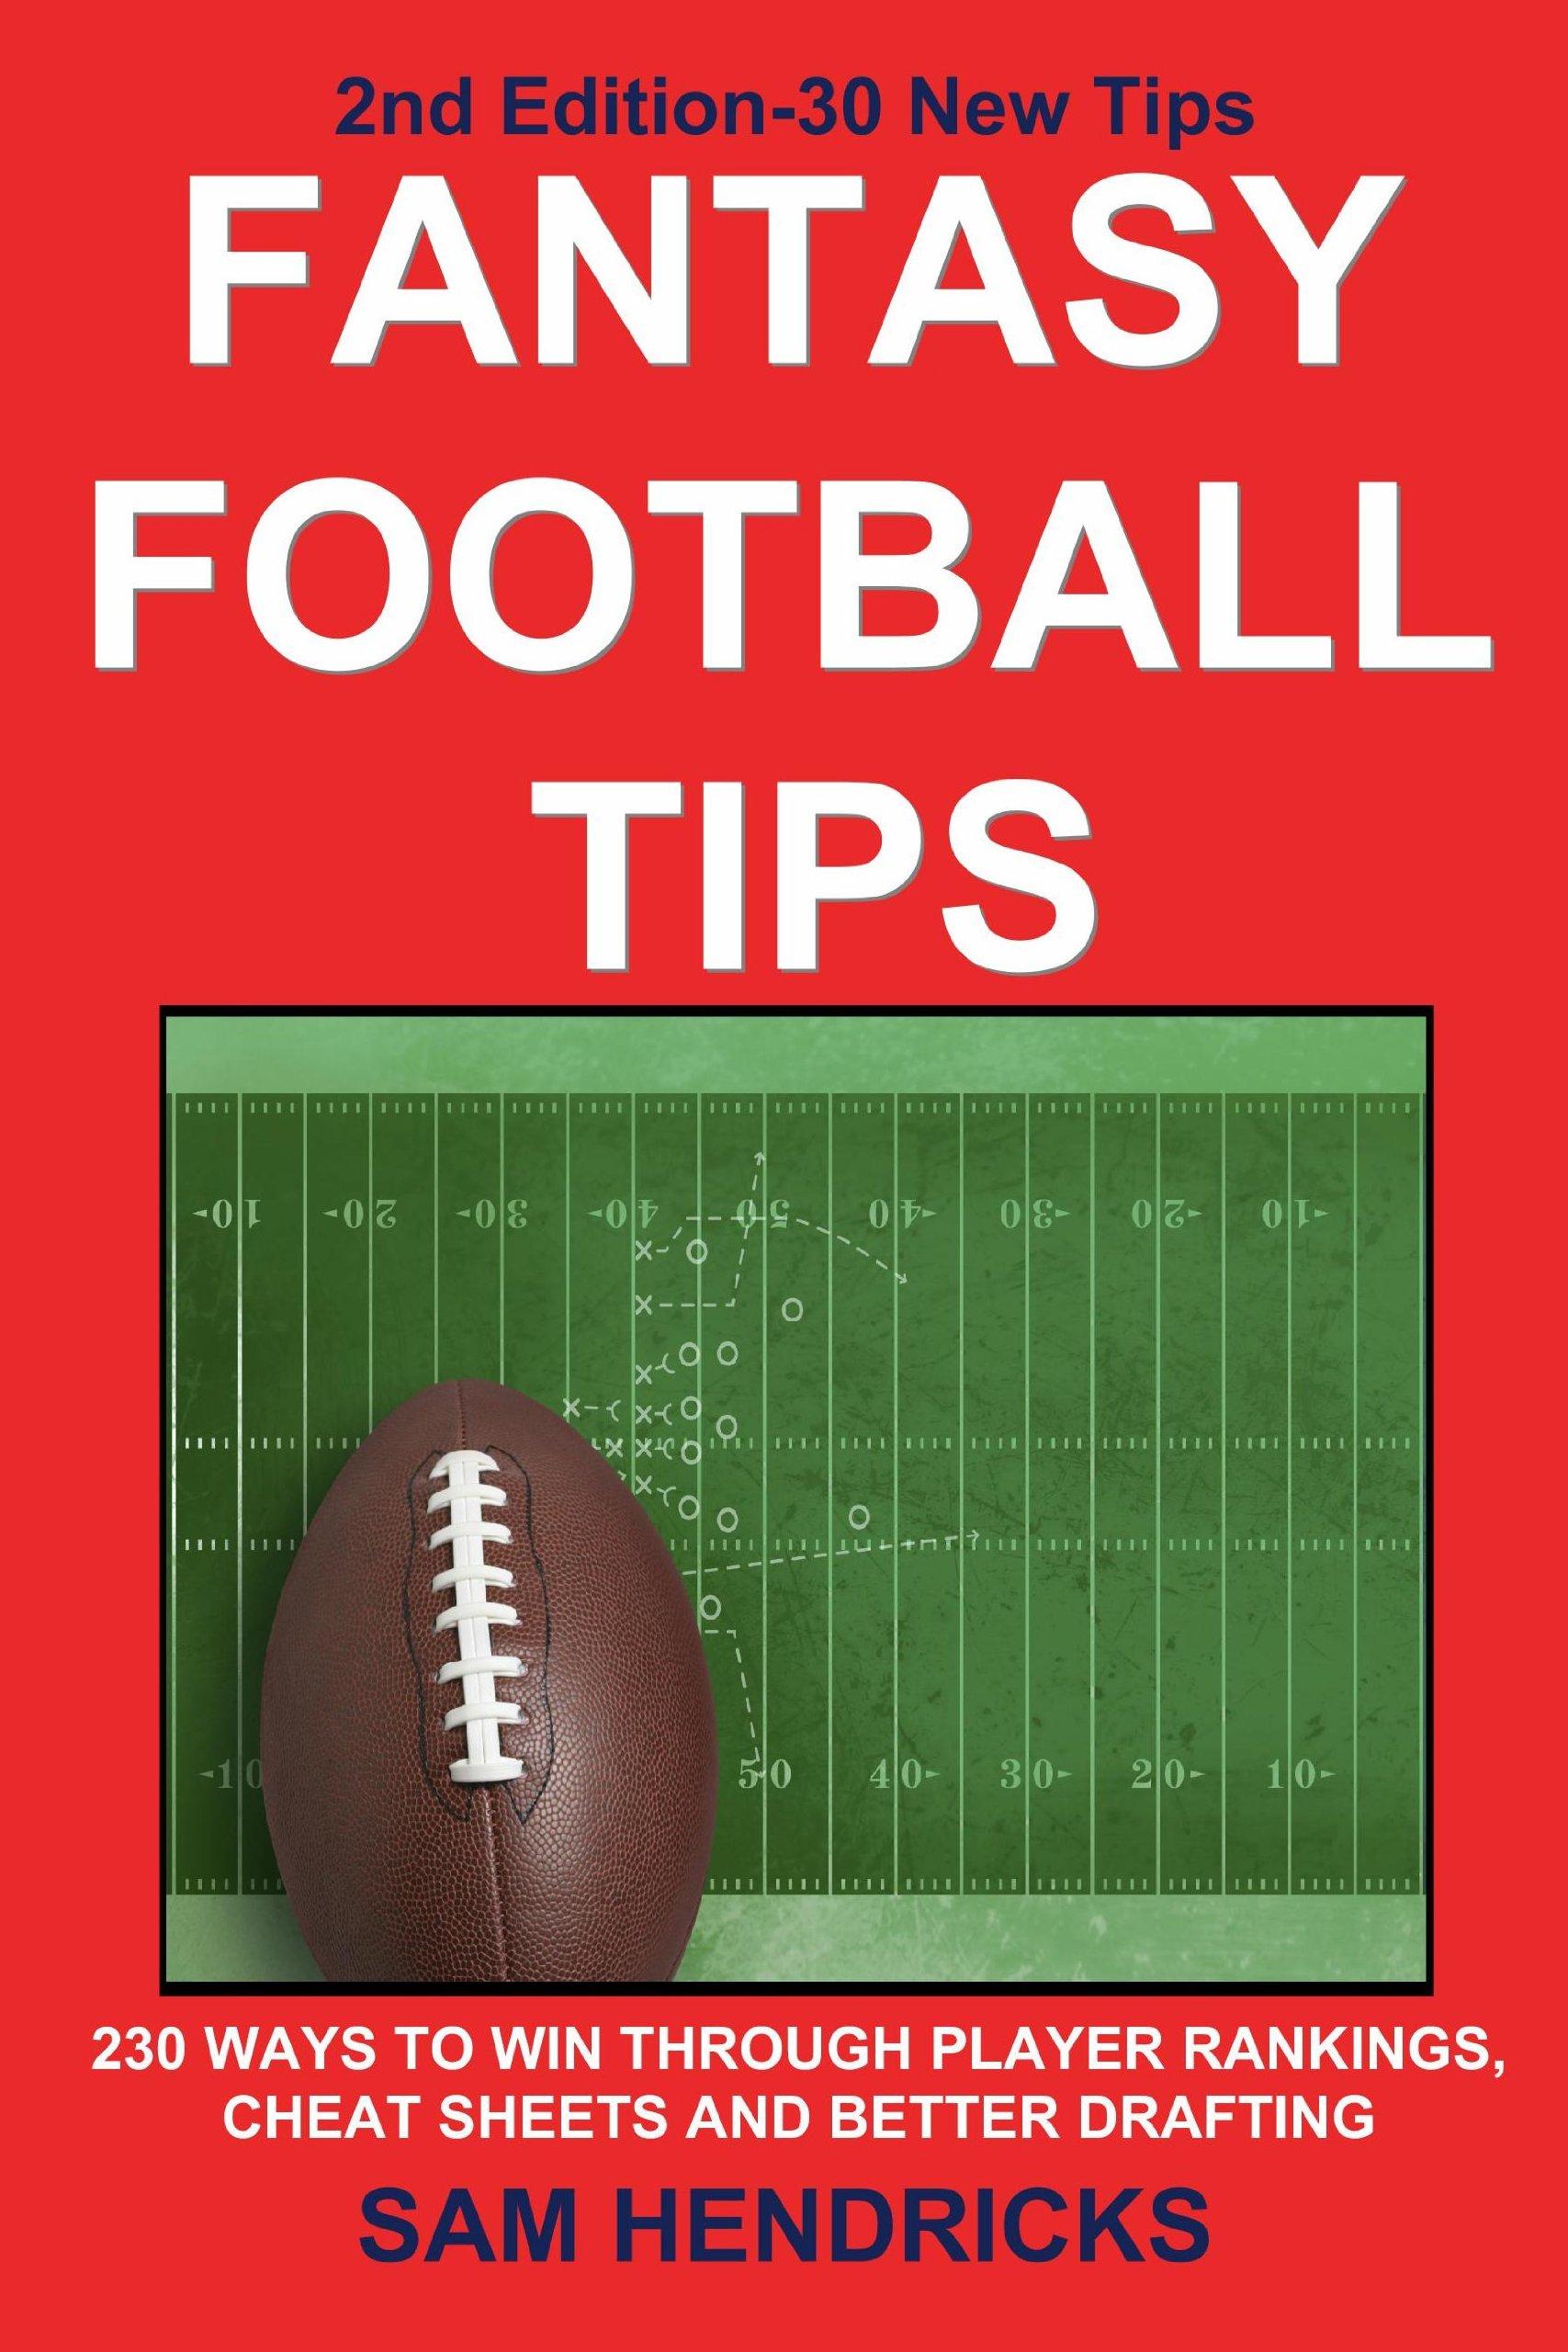 Cheap Free Fantasy Football Cheat Sheets Printable, Find Free - Fantasy Football Cheat Sheets Printable Free